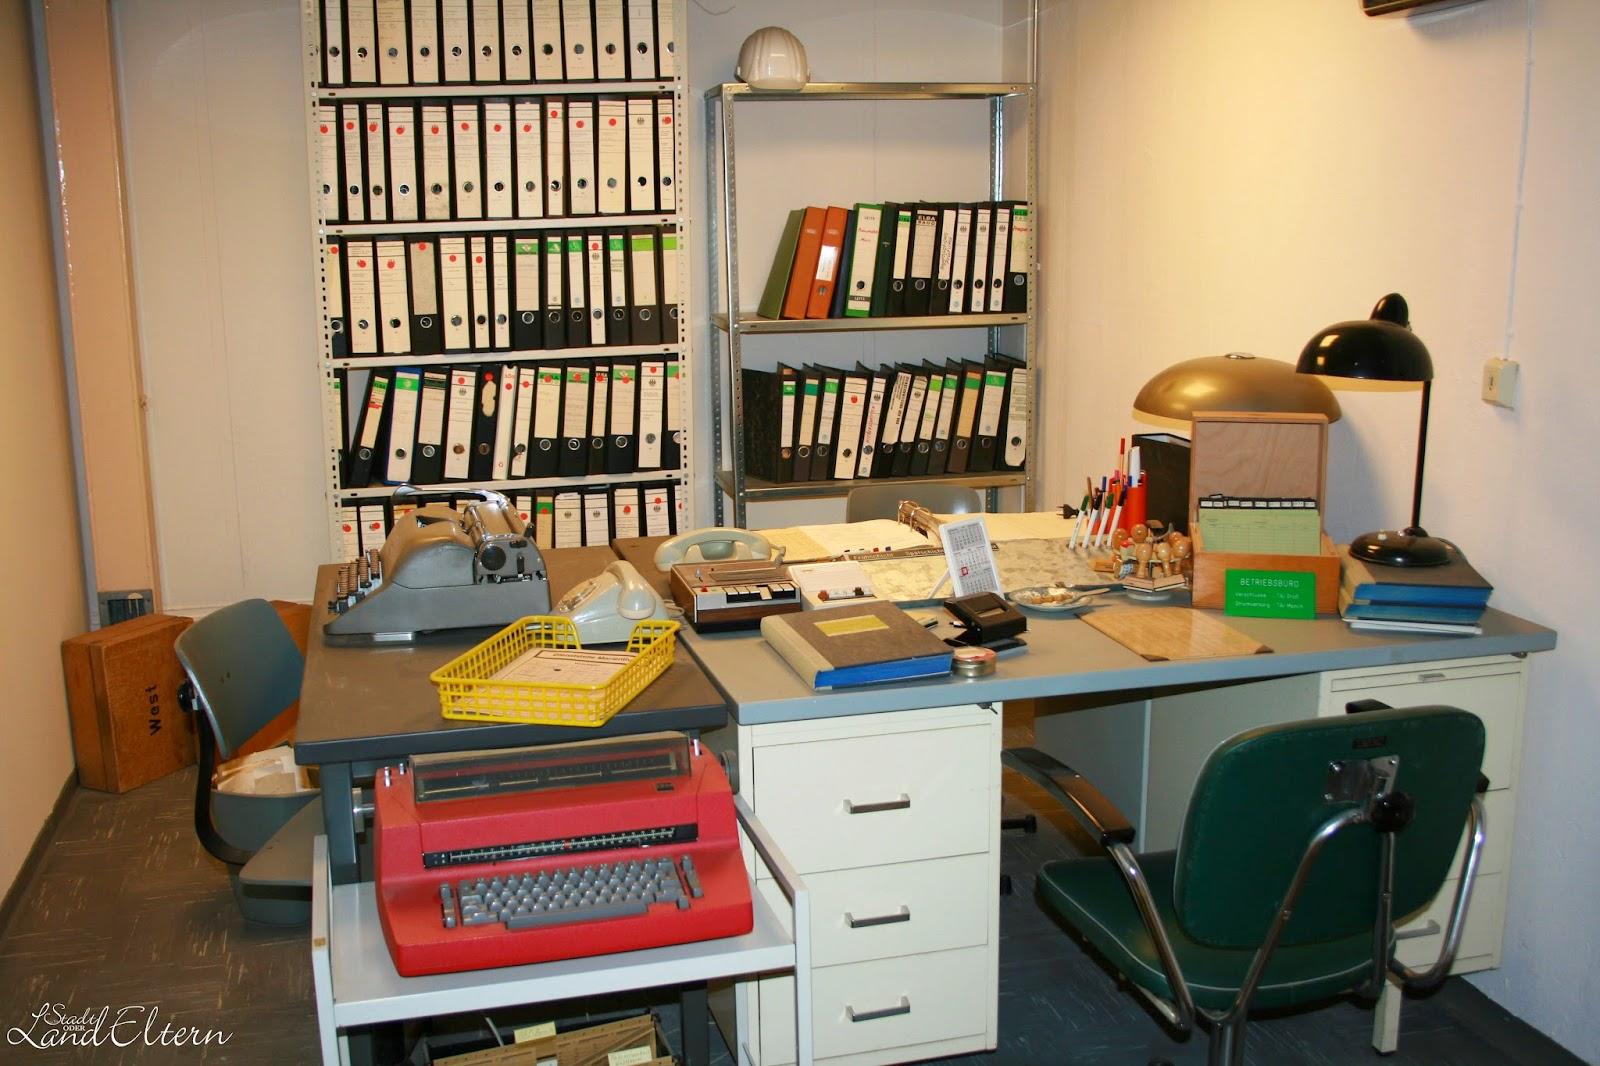 Dokumentationsstätte Regierungsstation Ahrweiler - Büro